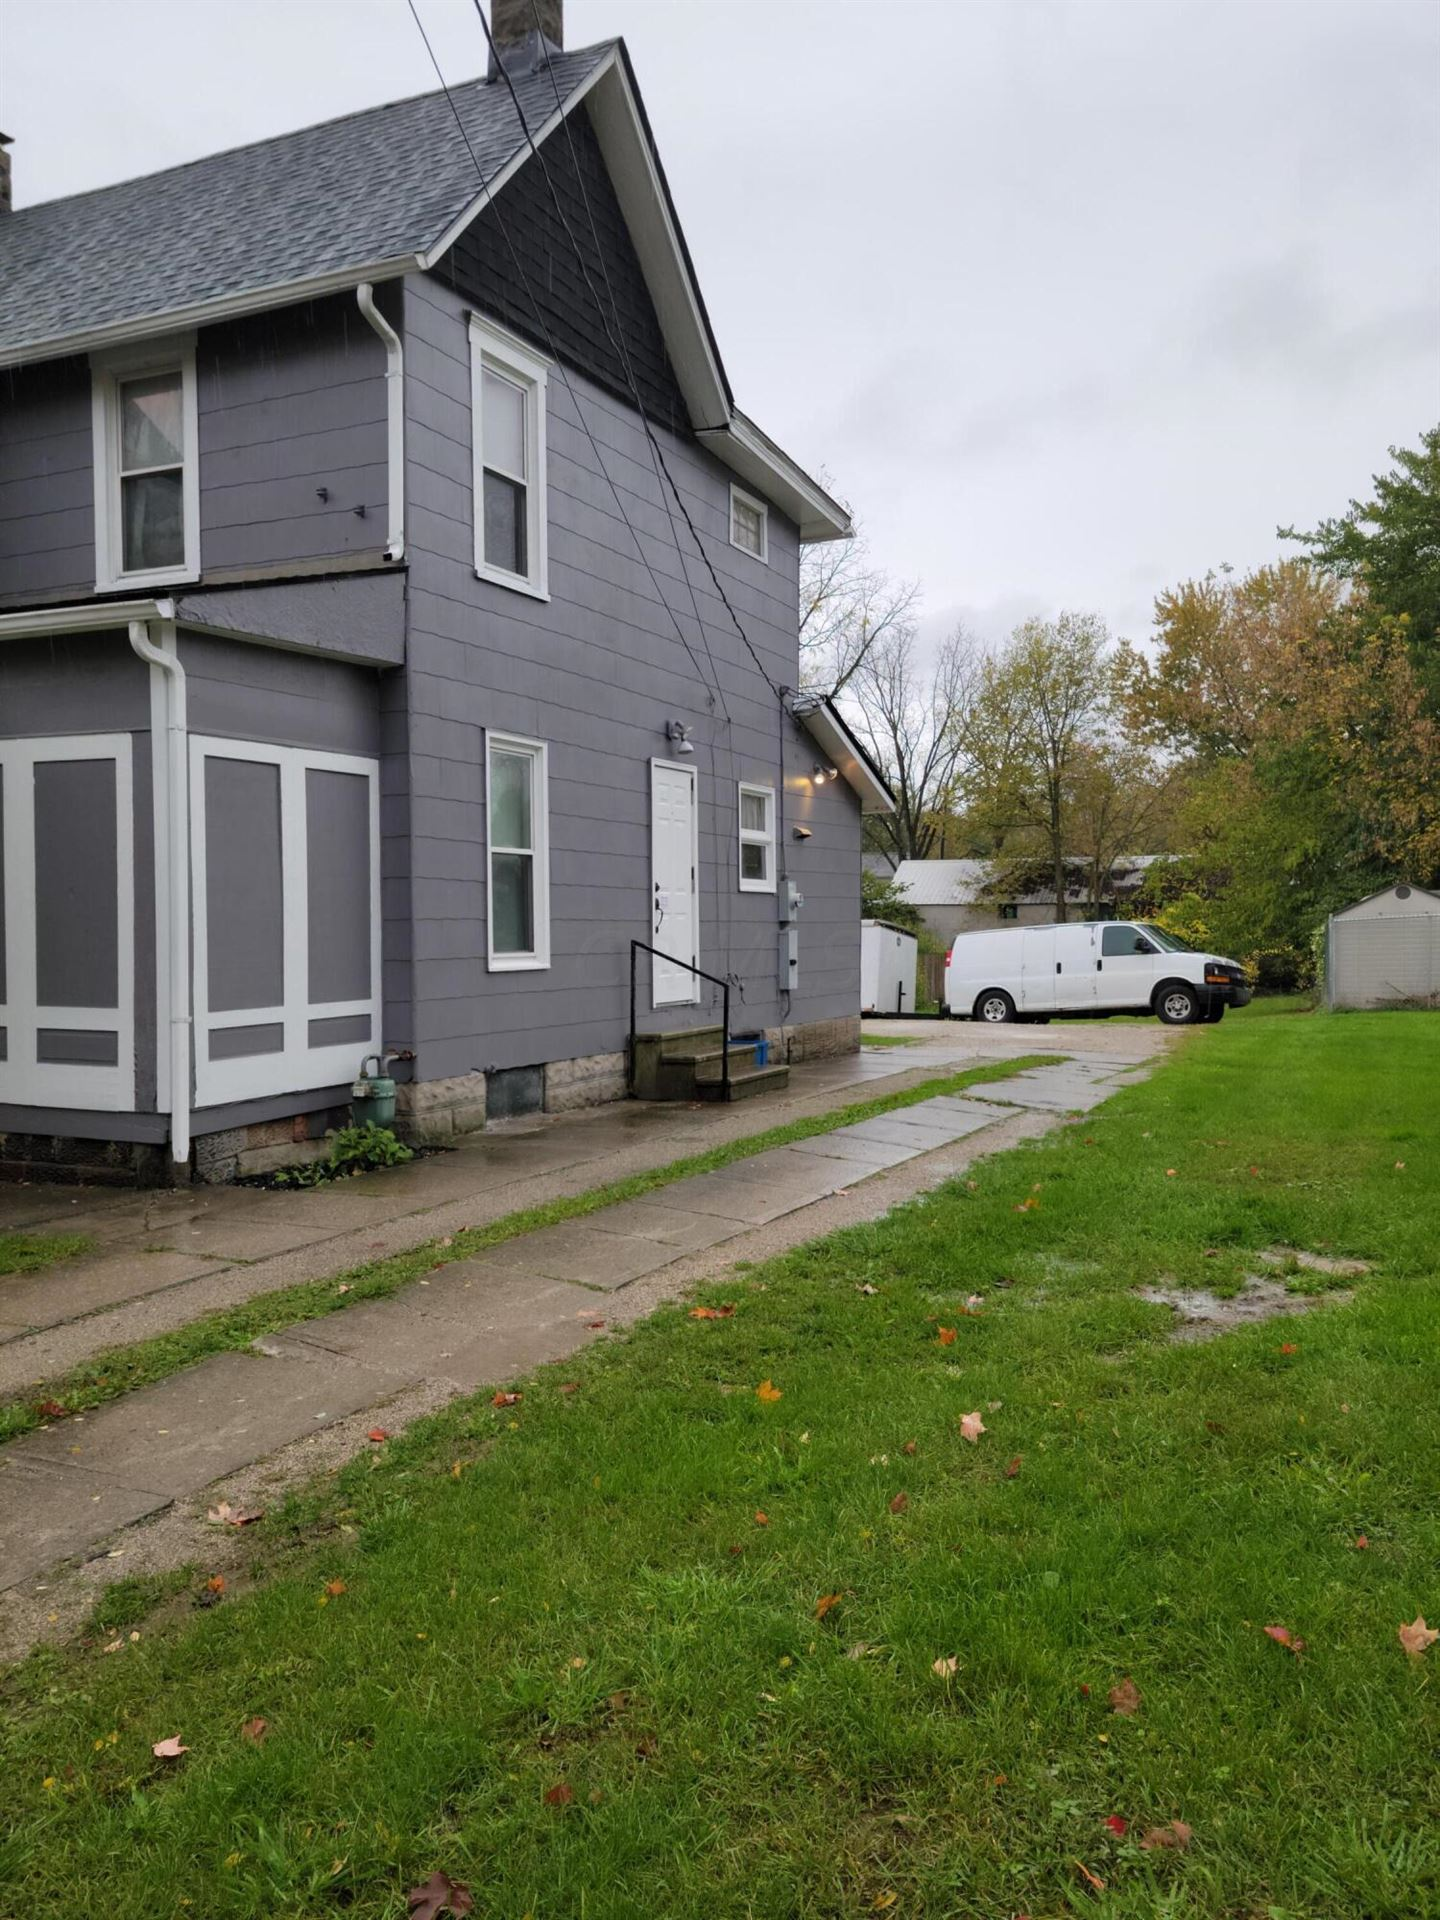 Photo of 222 S Franklin Street, Delaware, OH 43015 (MLS # 221040843)